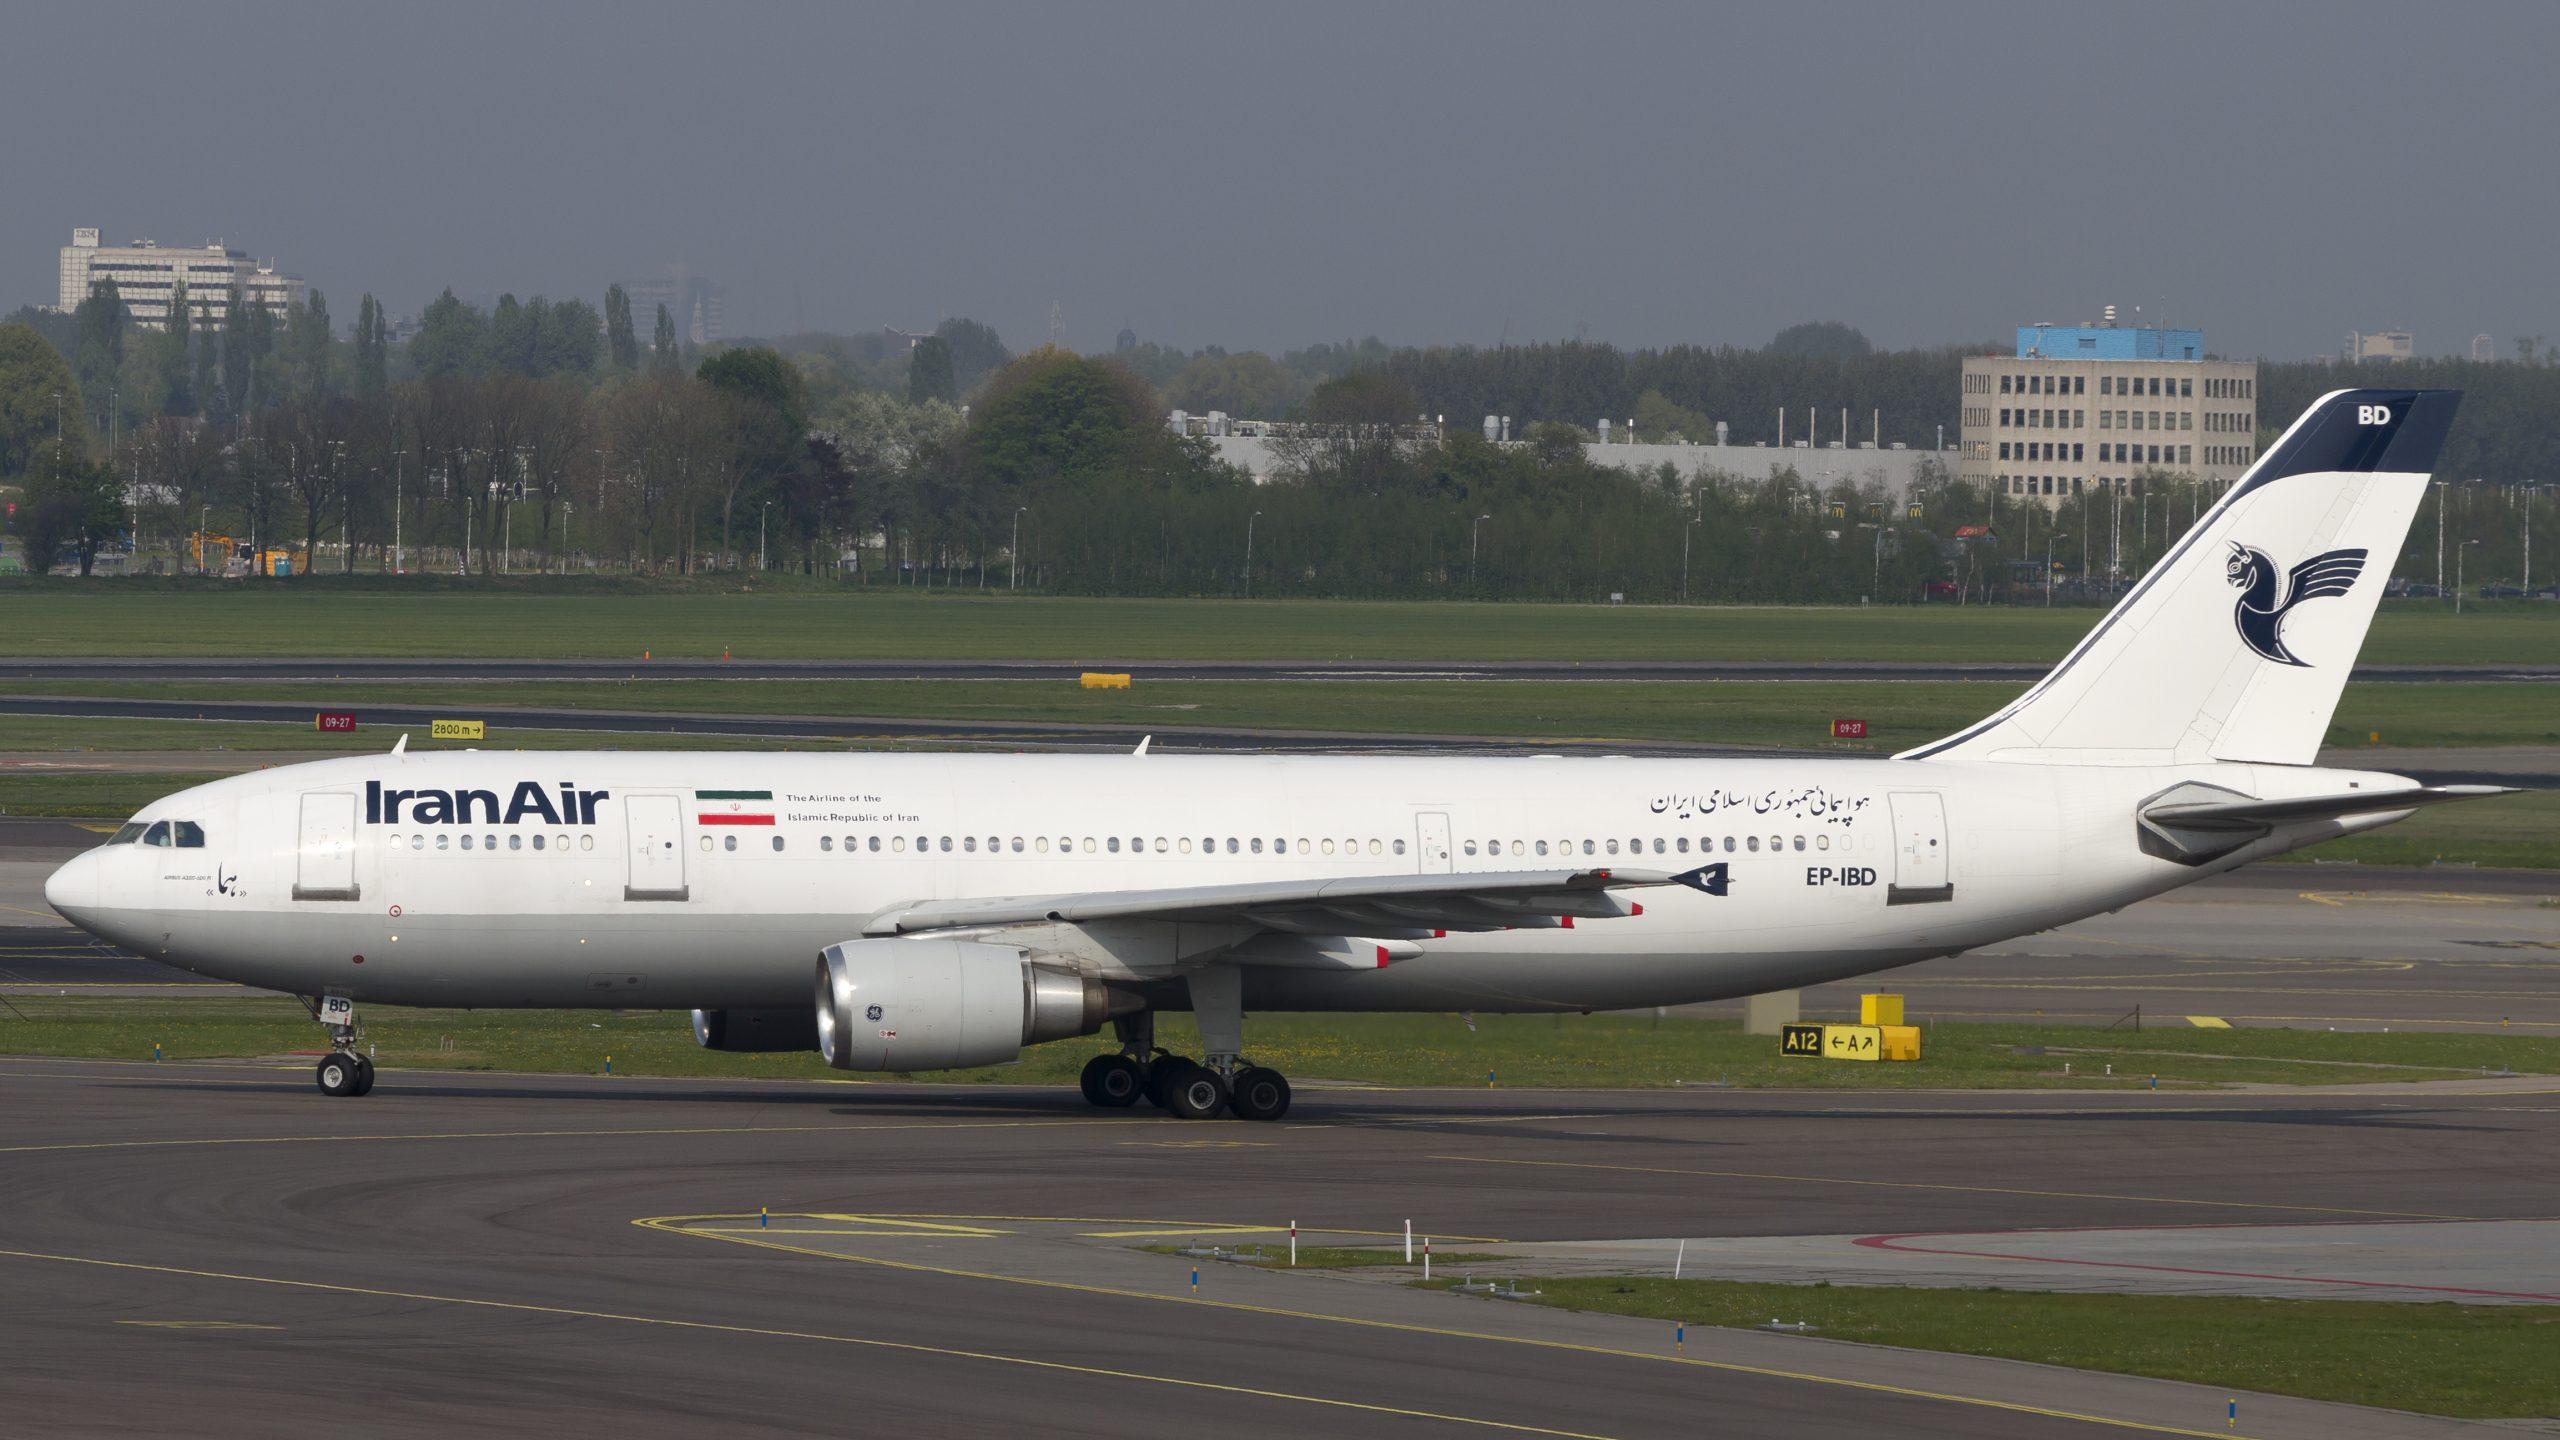 En Airbus A300-600R fra Iran Air. Foto: © Thorbjørn Brunander Sund, Danish Aviation Photo